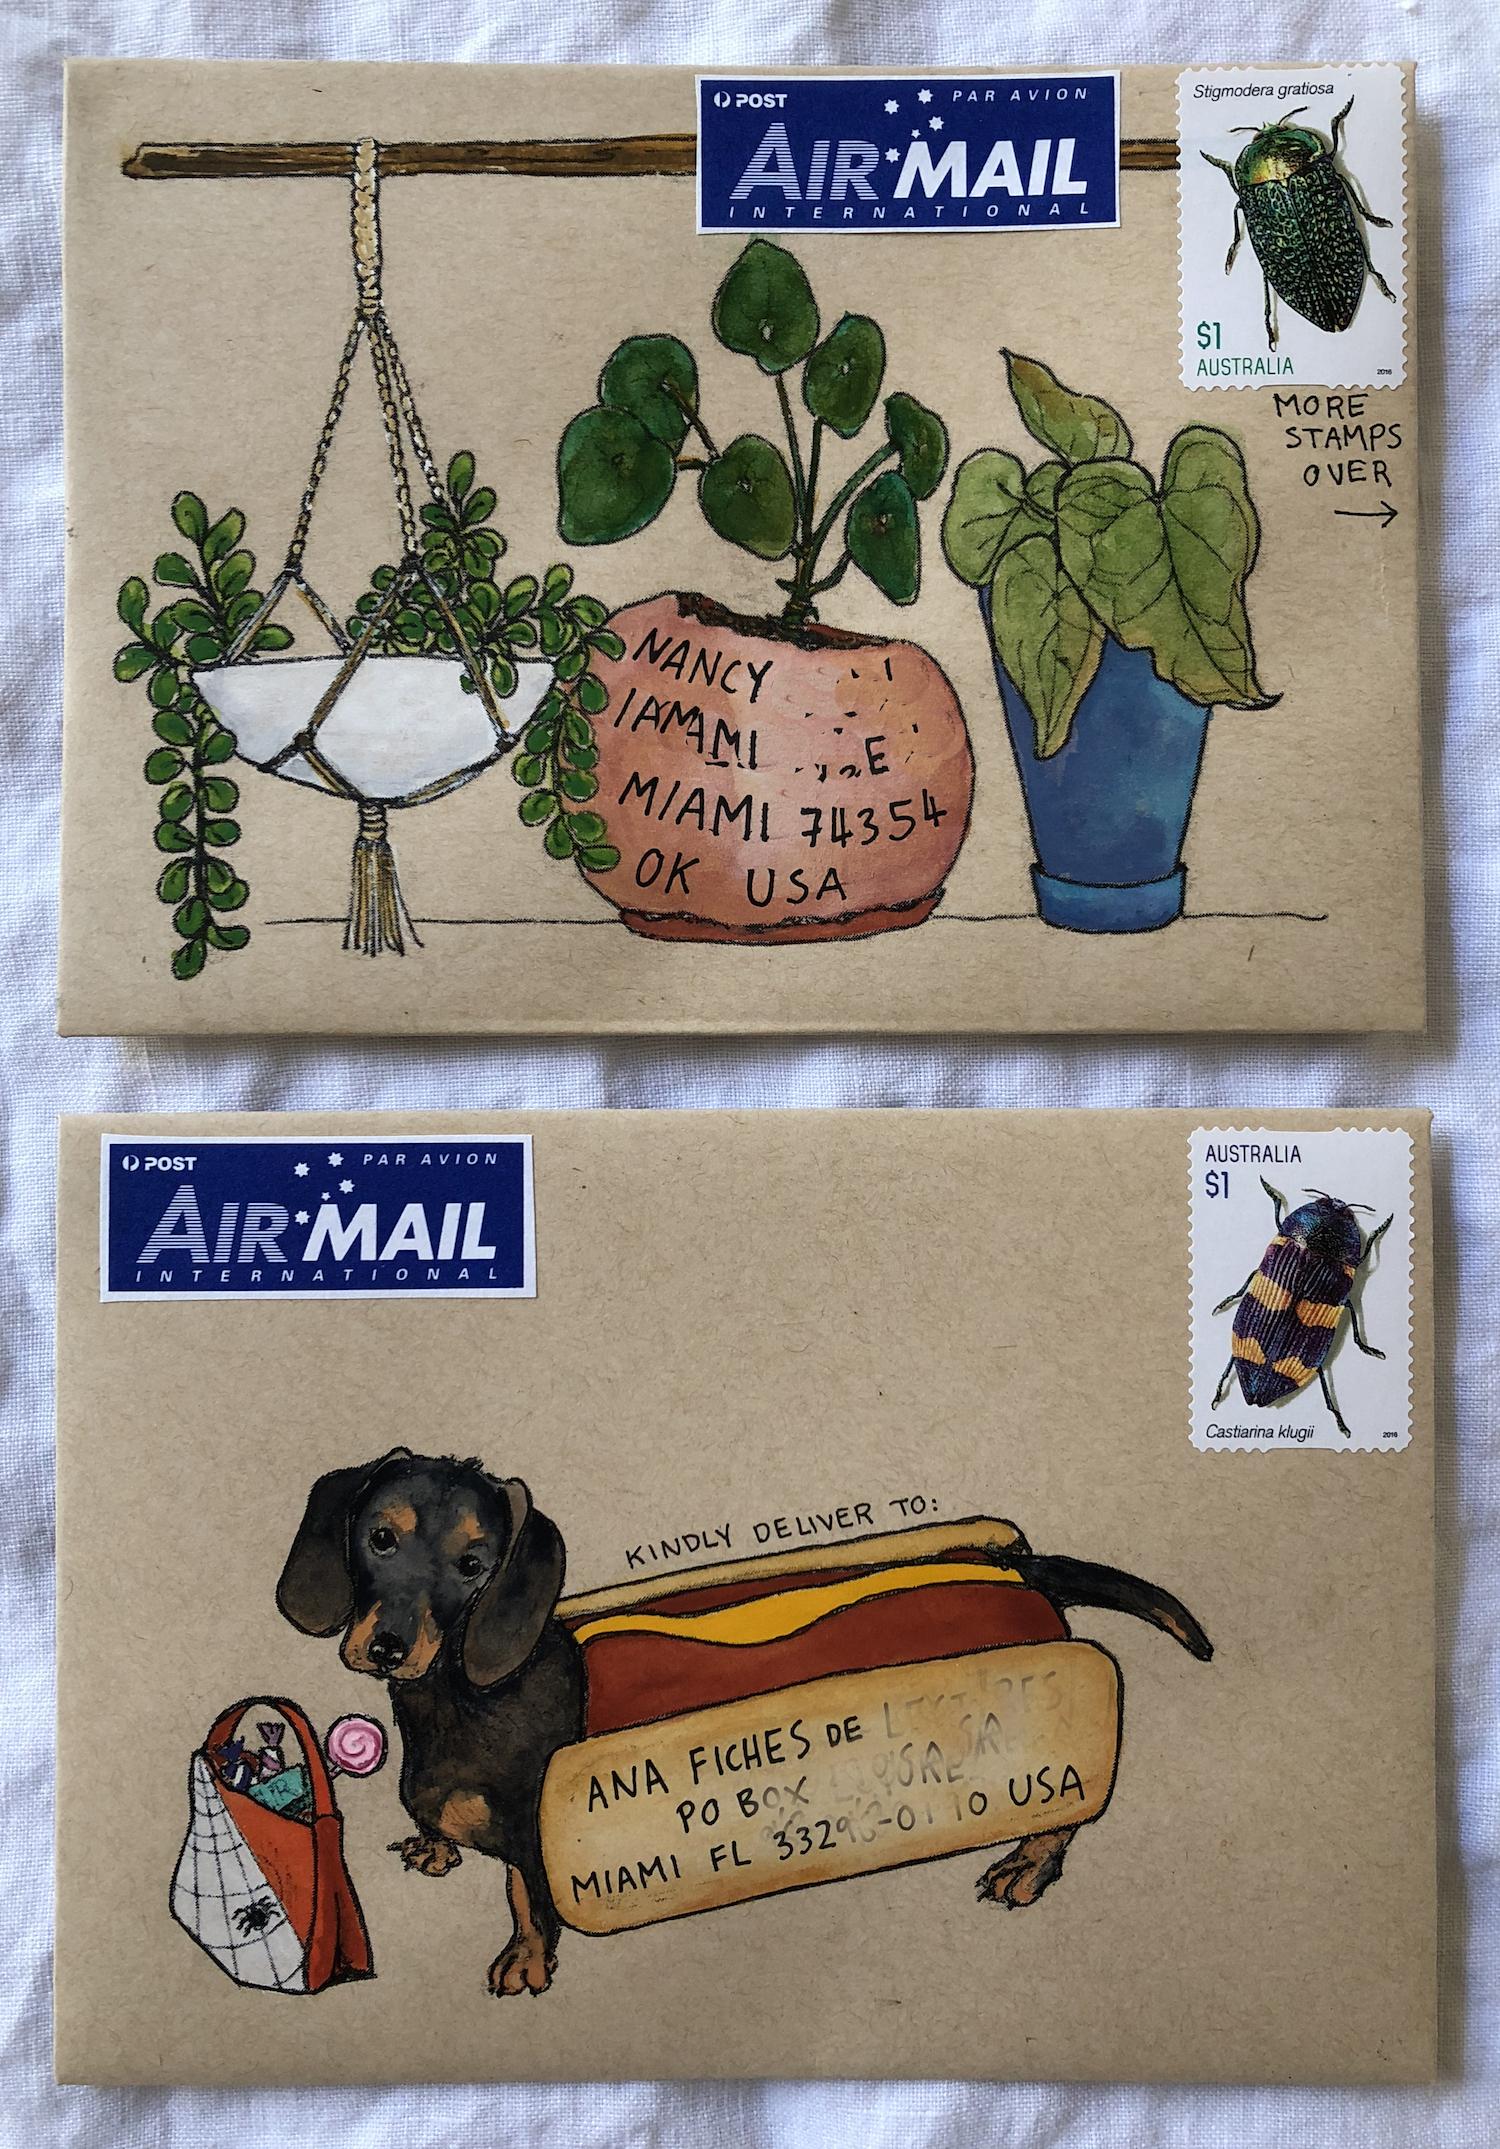 mail-art-2.jpg